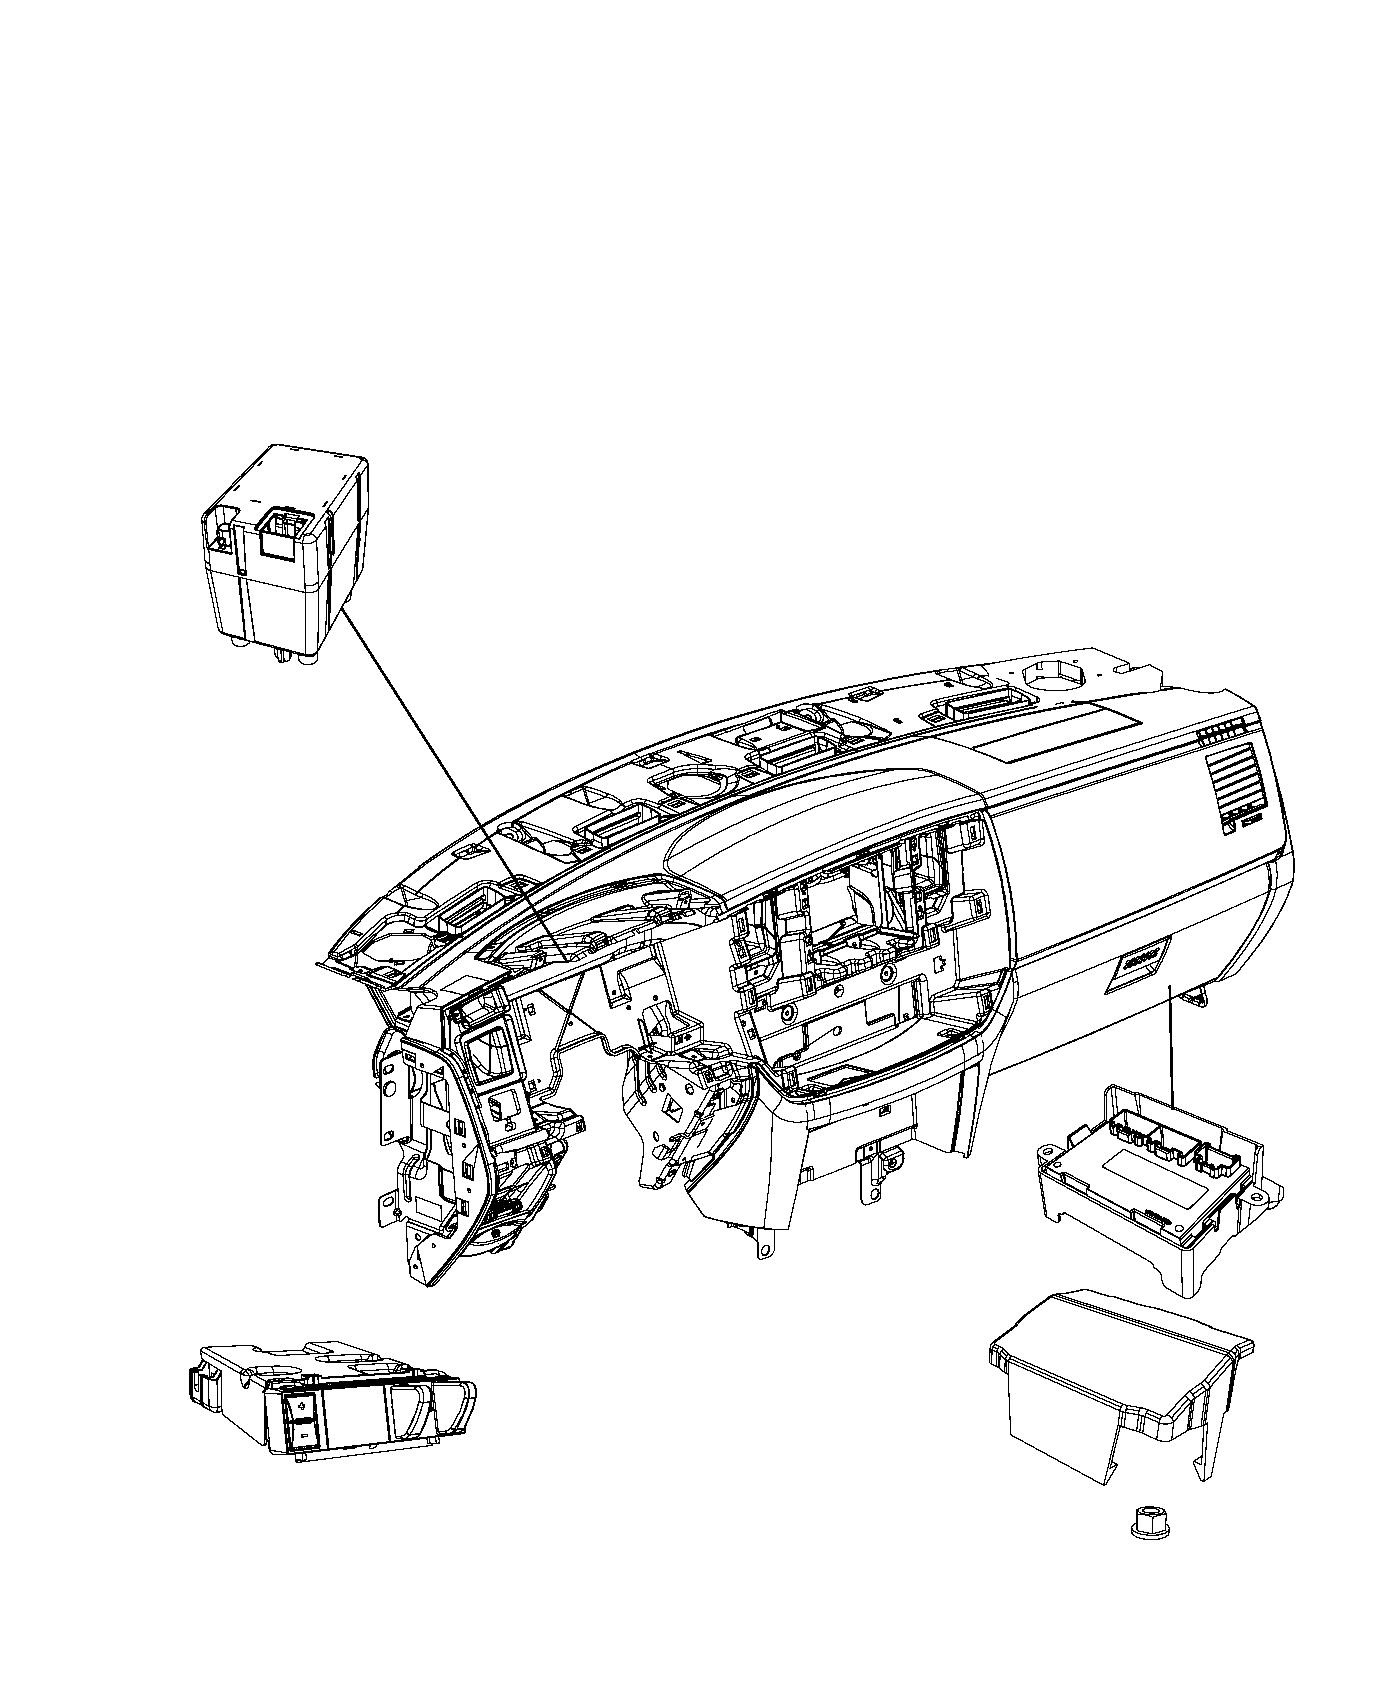 2013 Dodge Ram 4500 Receiver. Hub. Start, remote, system